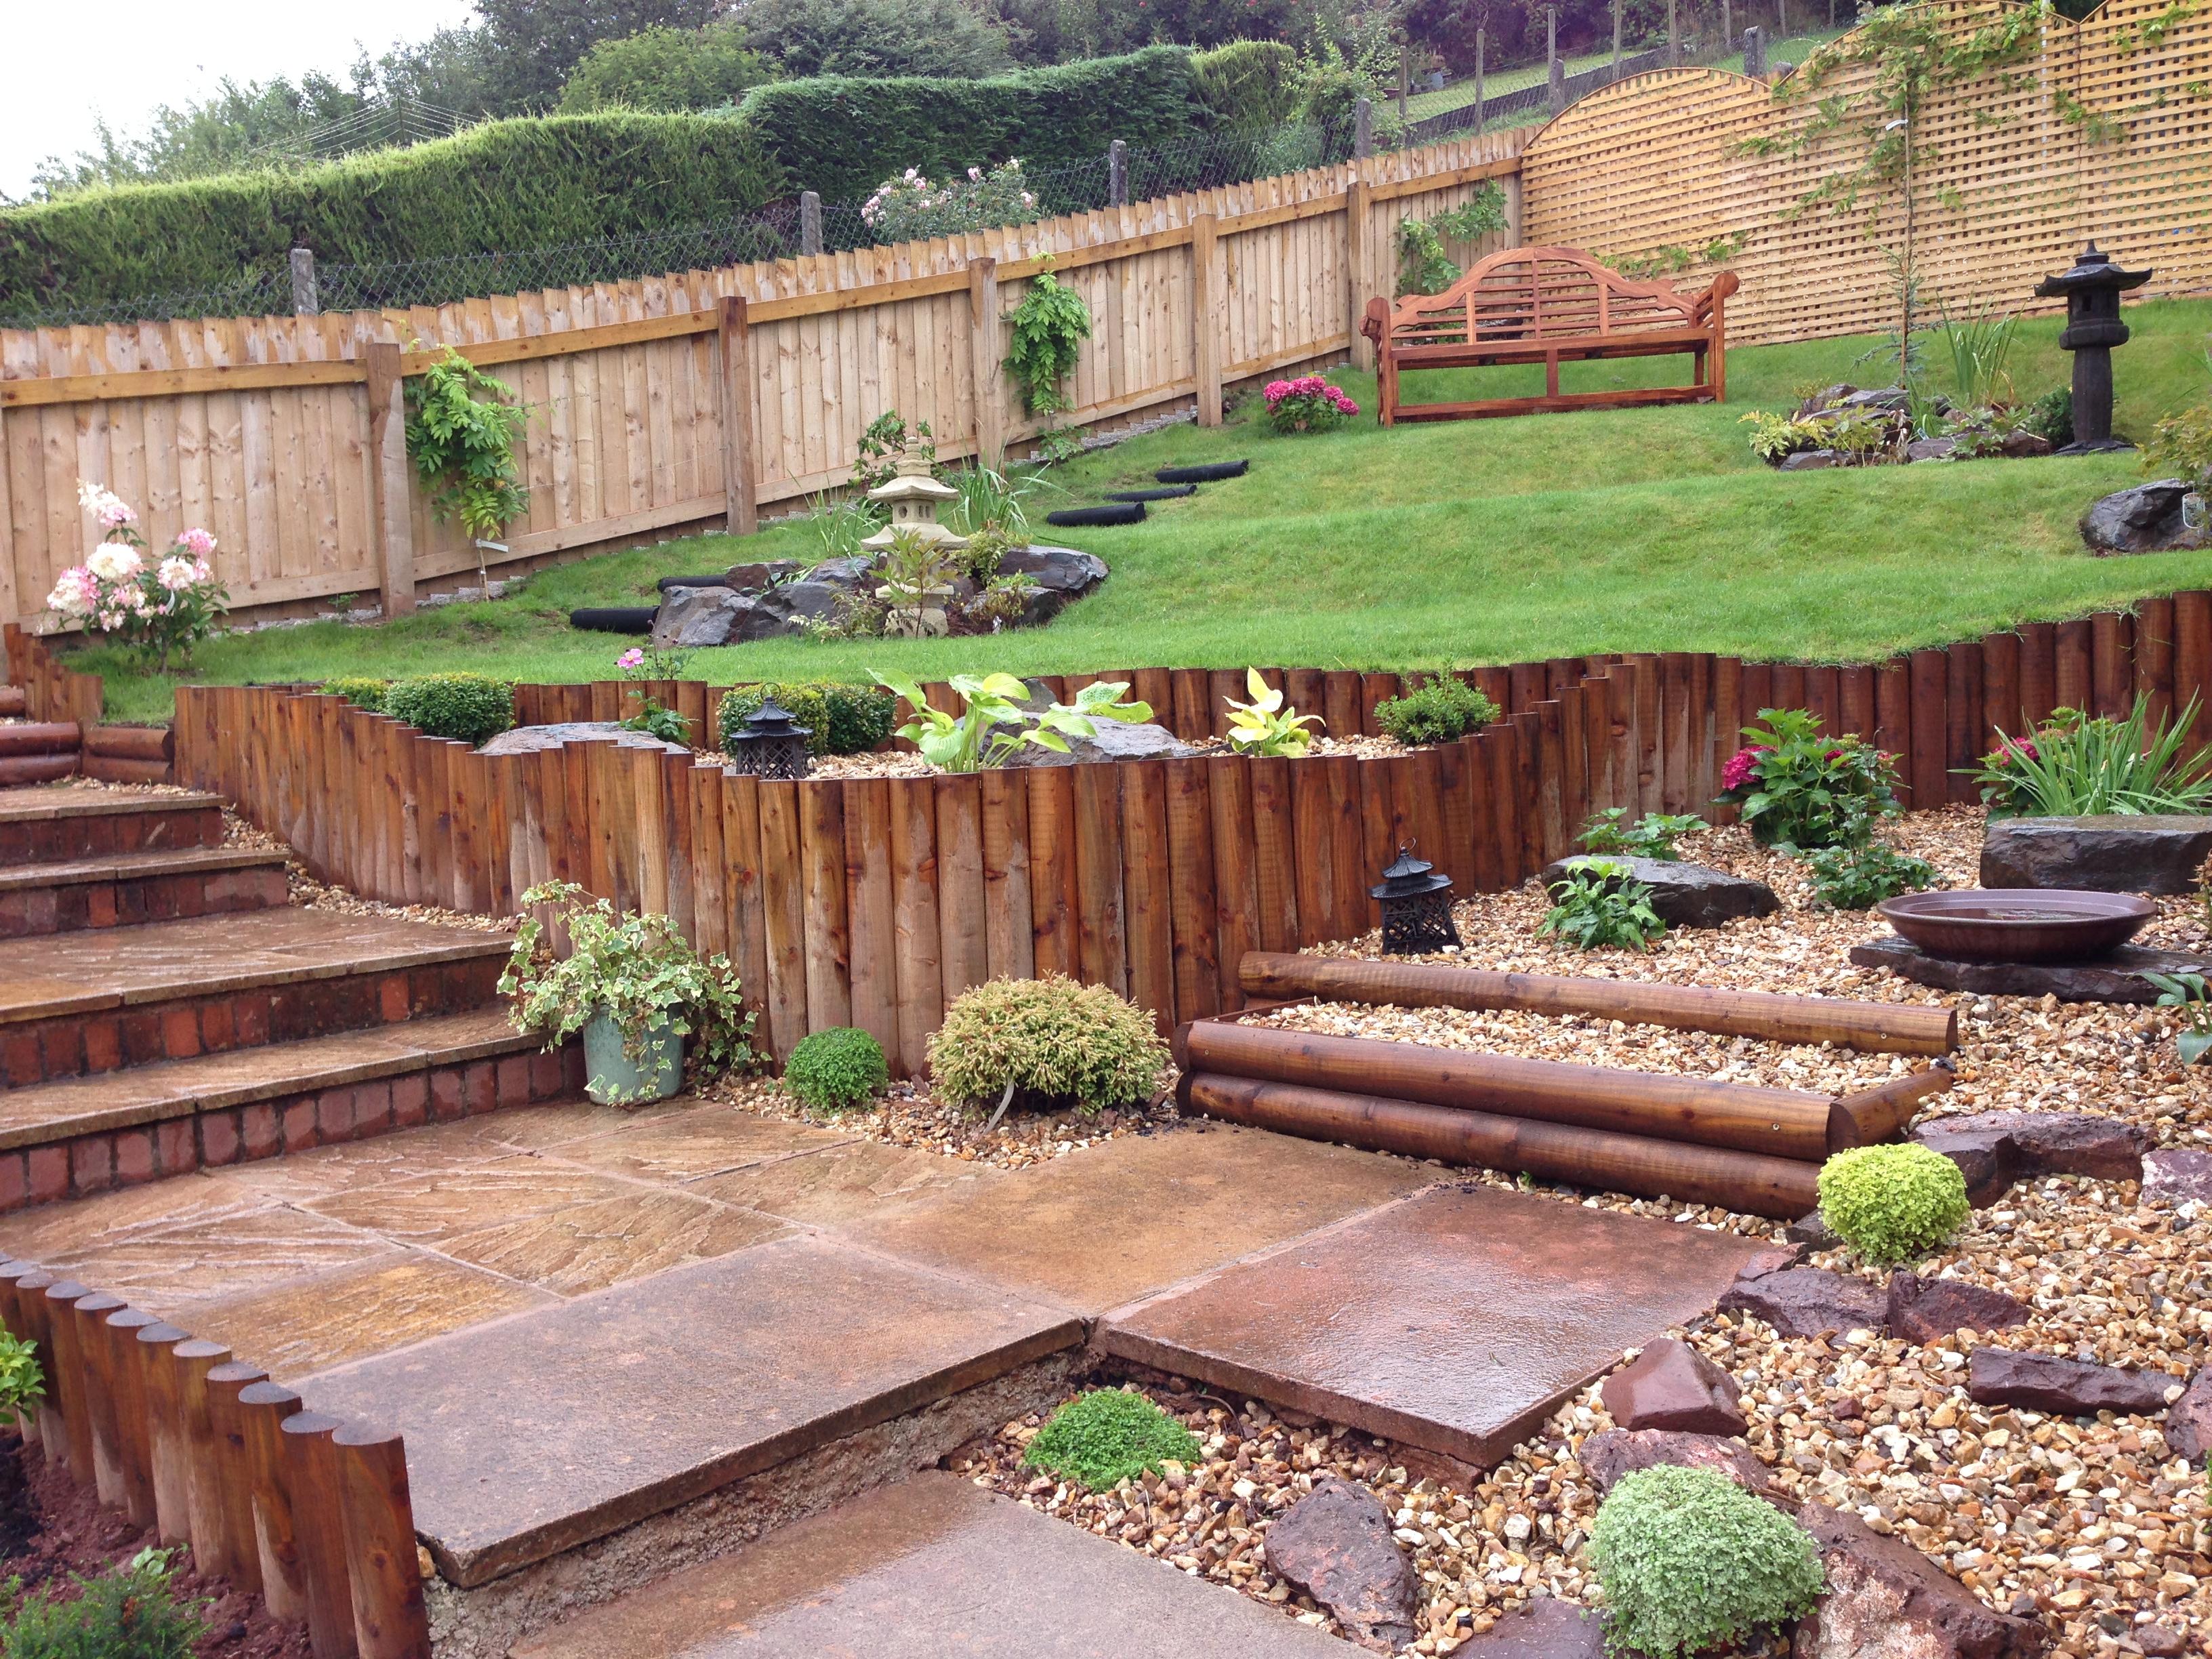 Exeter Japanese Garden Designer Plant A Seed Garden Design